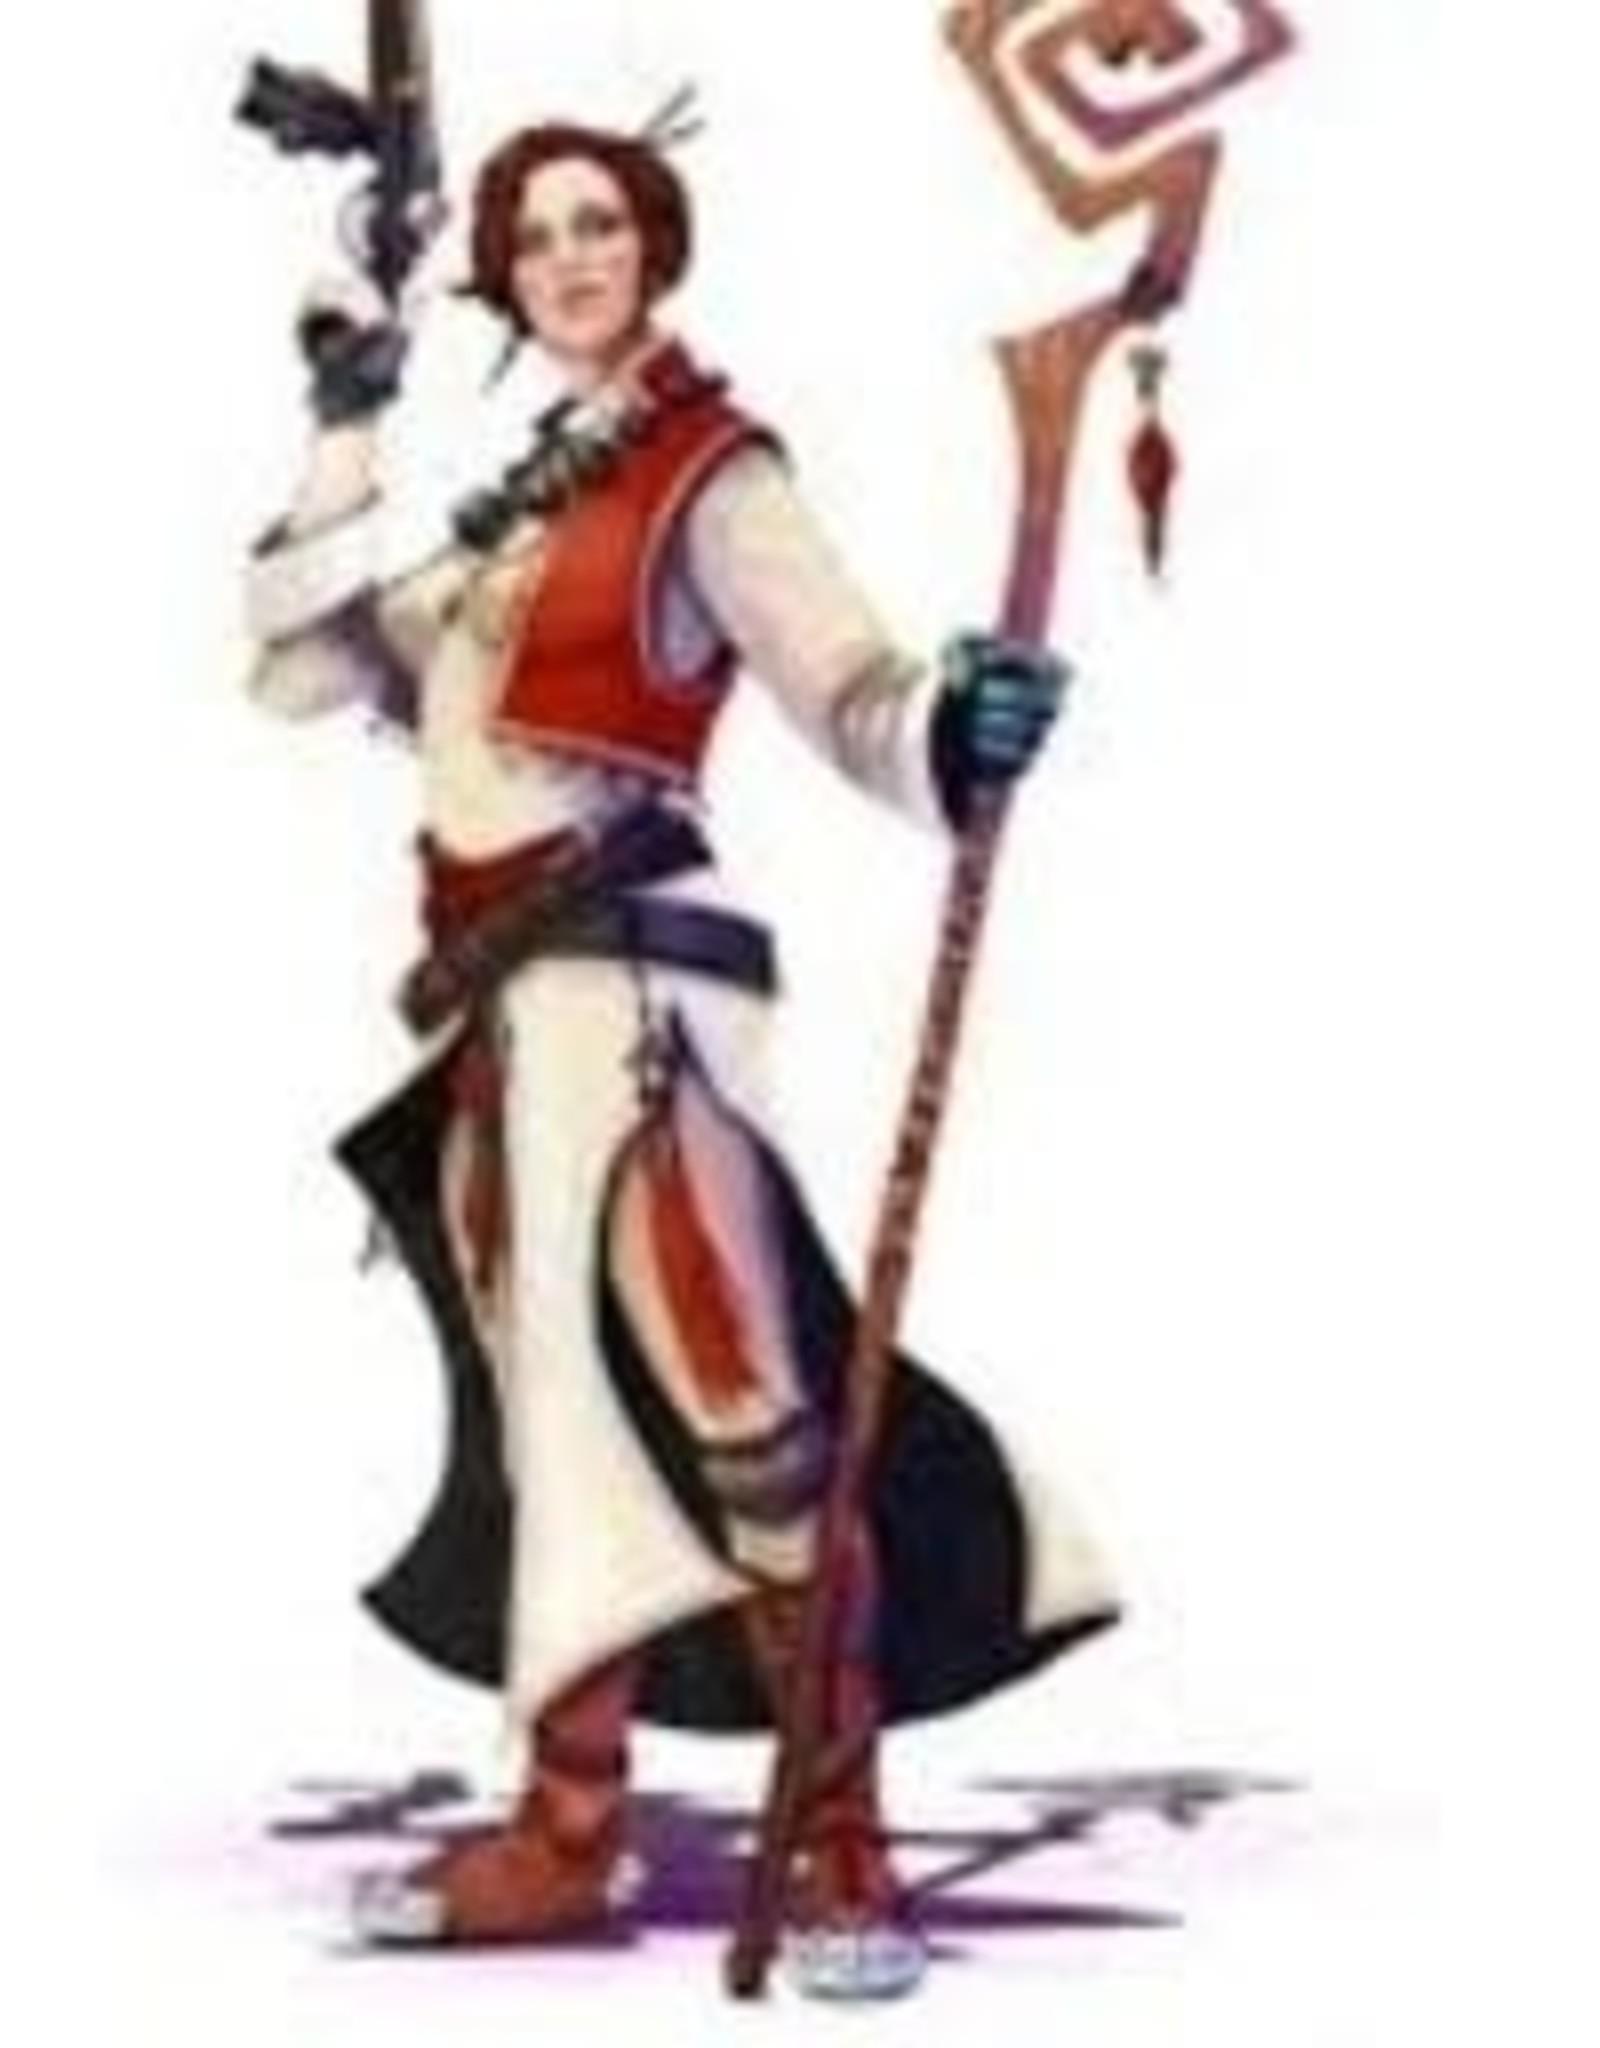 Demented Games Tricia Harker - Resin